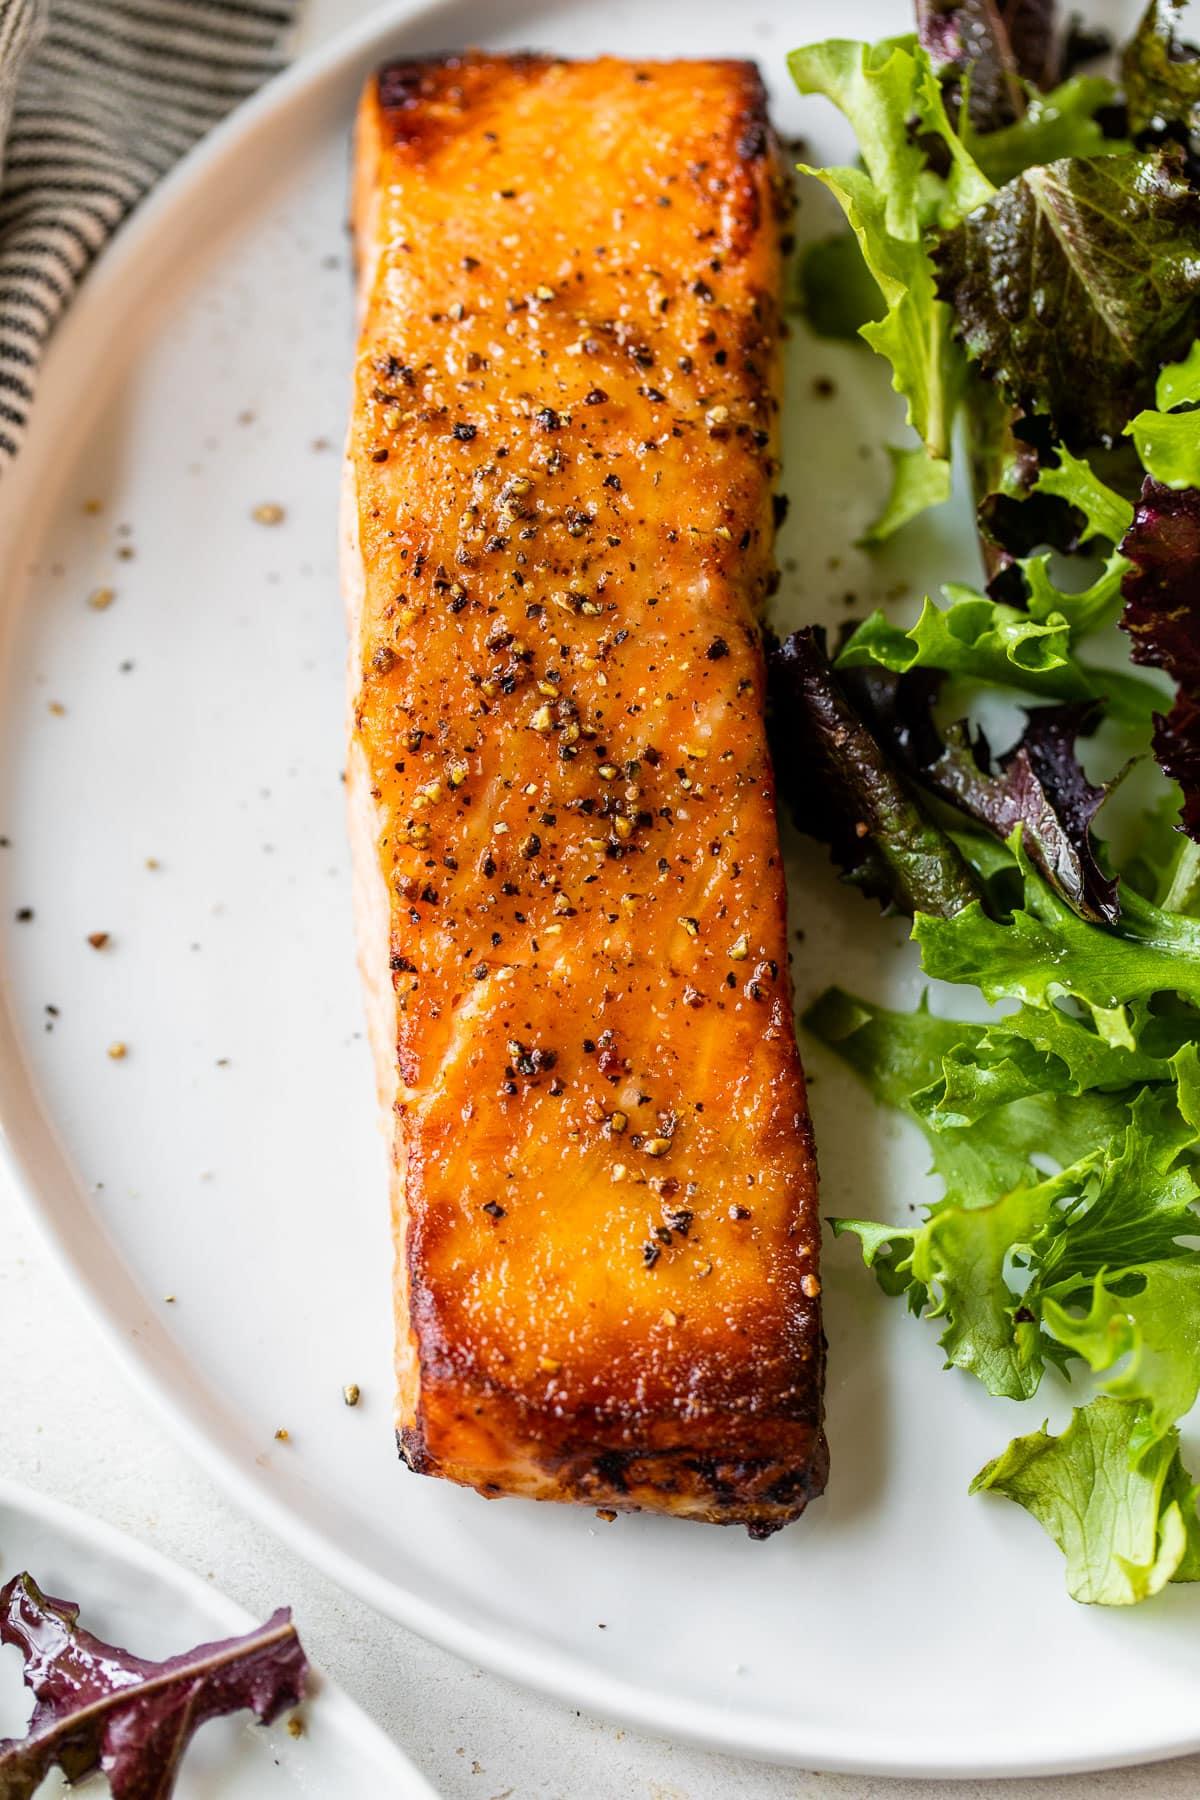 Honey garlic air fryer salmon on a plate